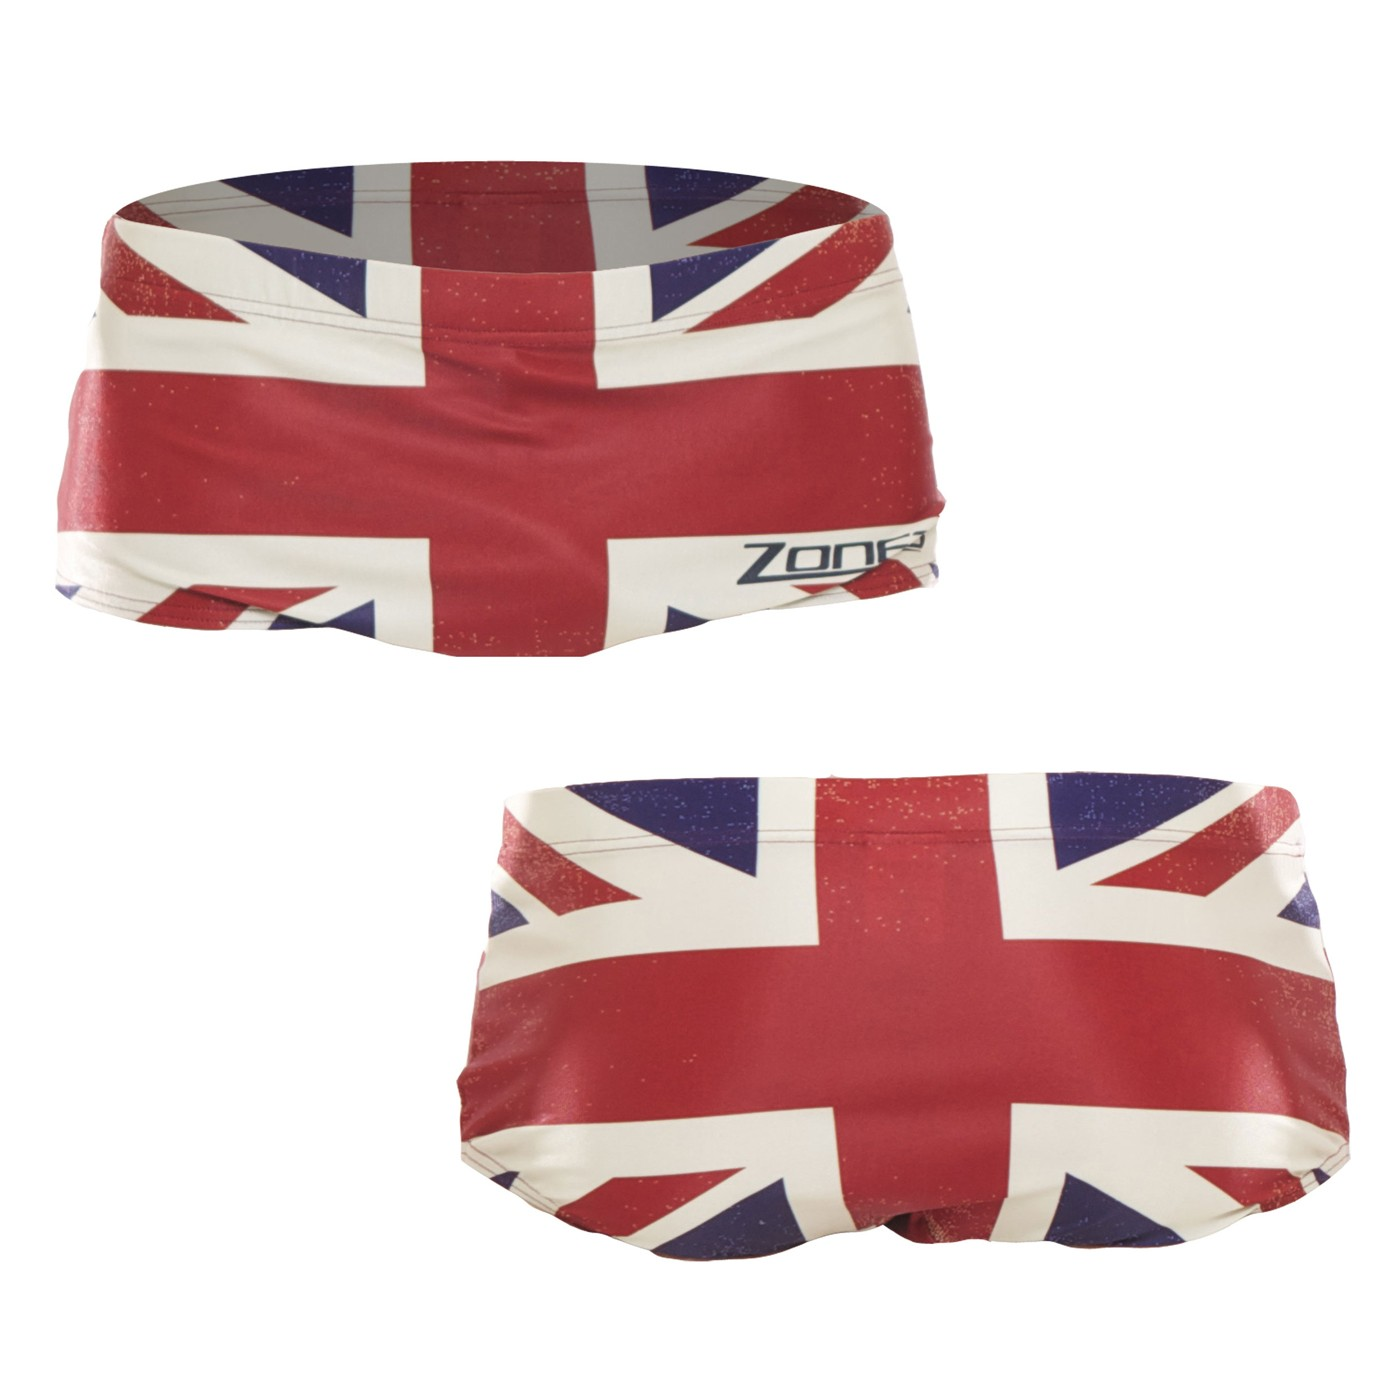 ZONE3 UNION JACK SWIMMING COSTUME SWIM SHORT - Training swimsuits ... 18c923d5efdf